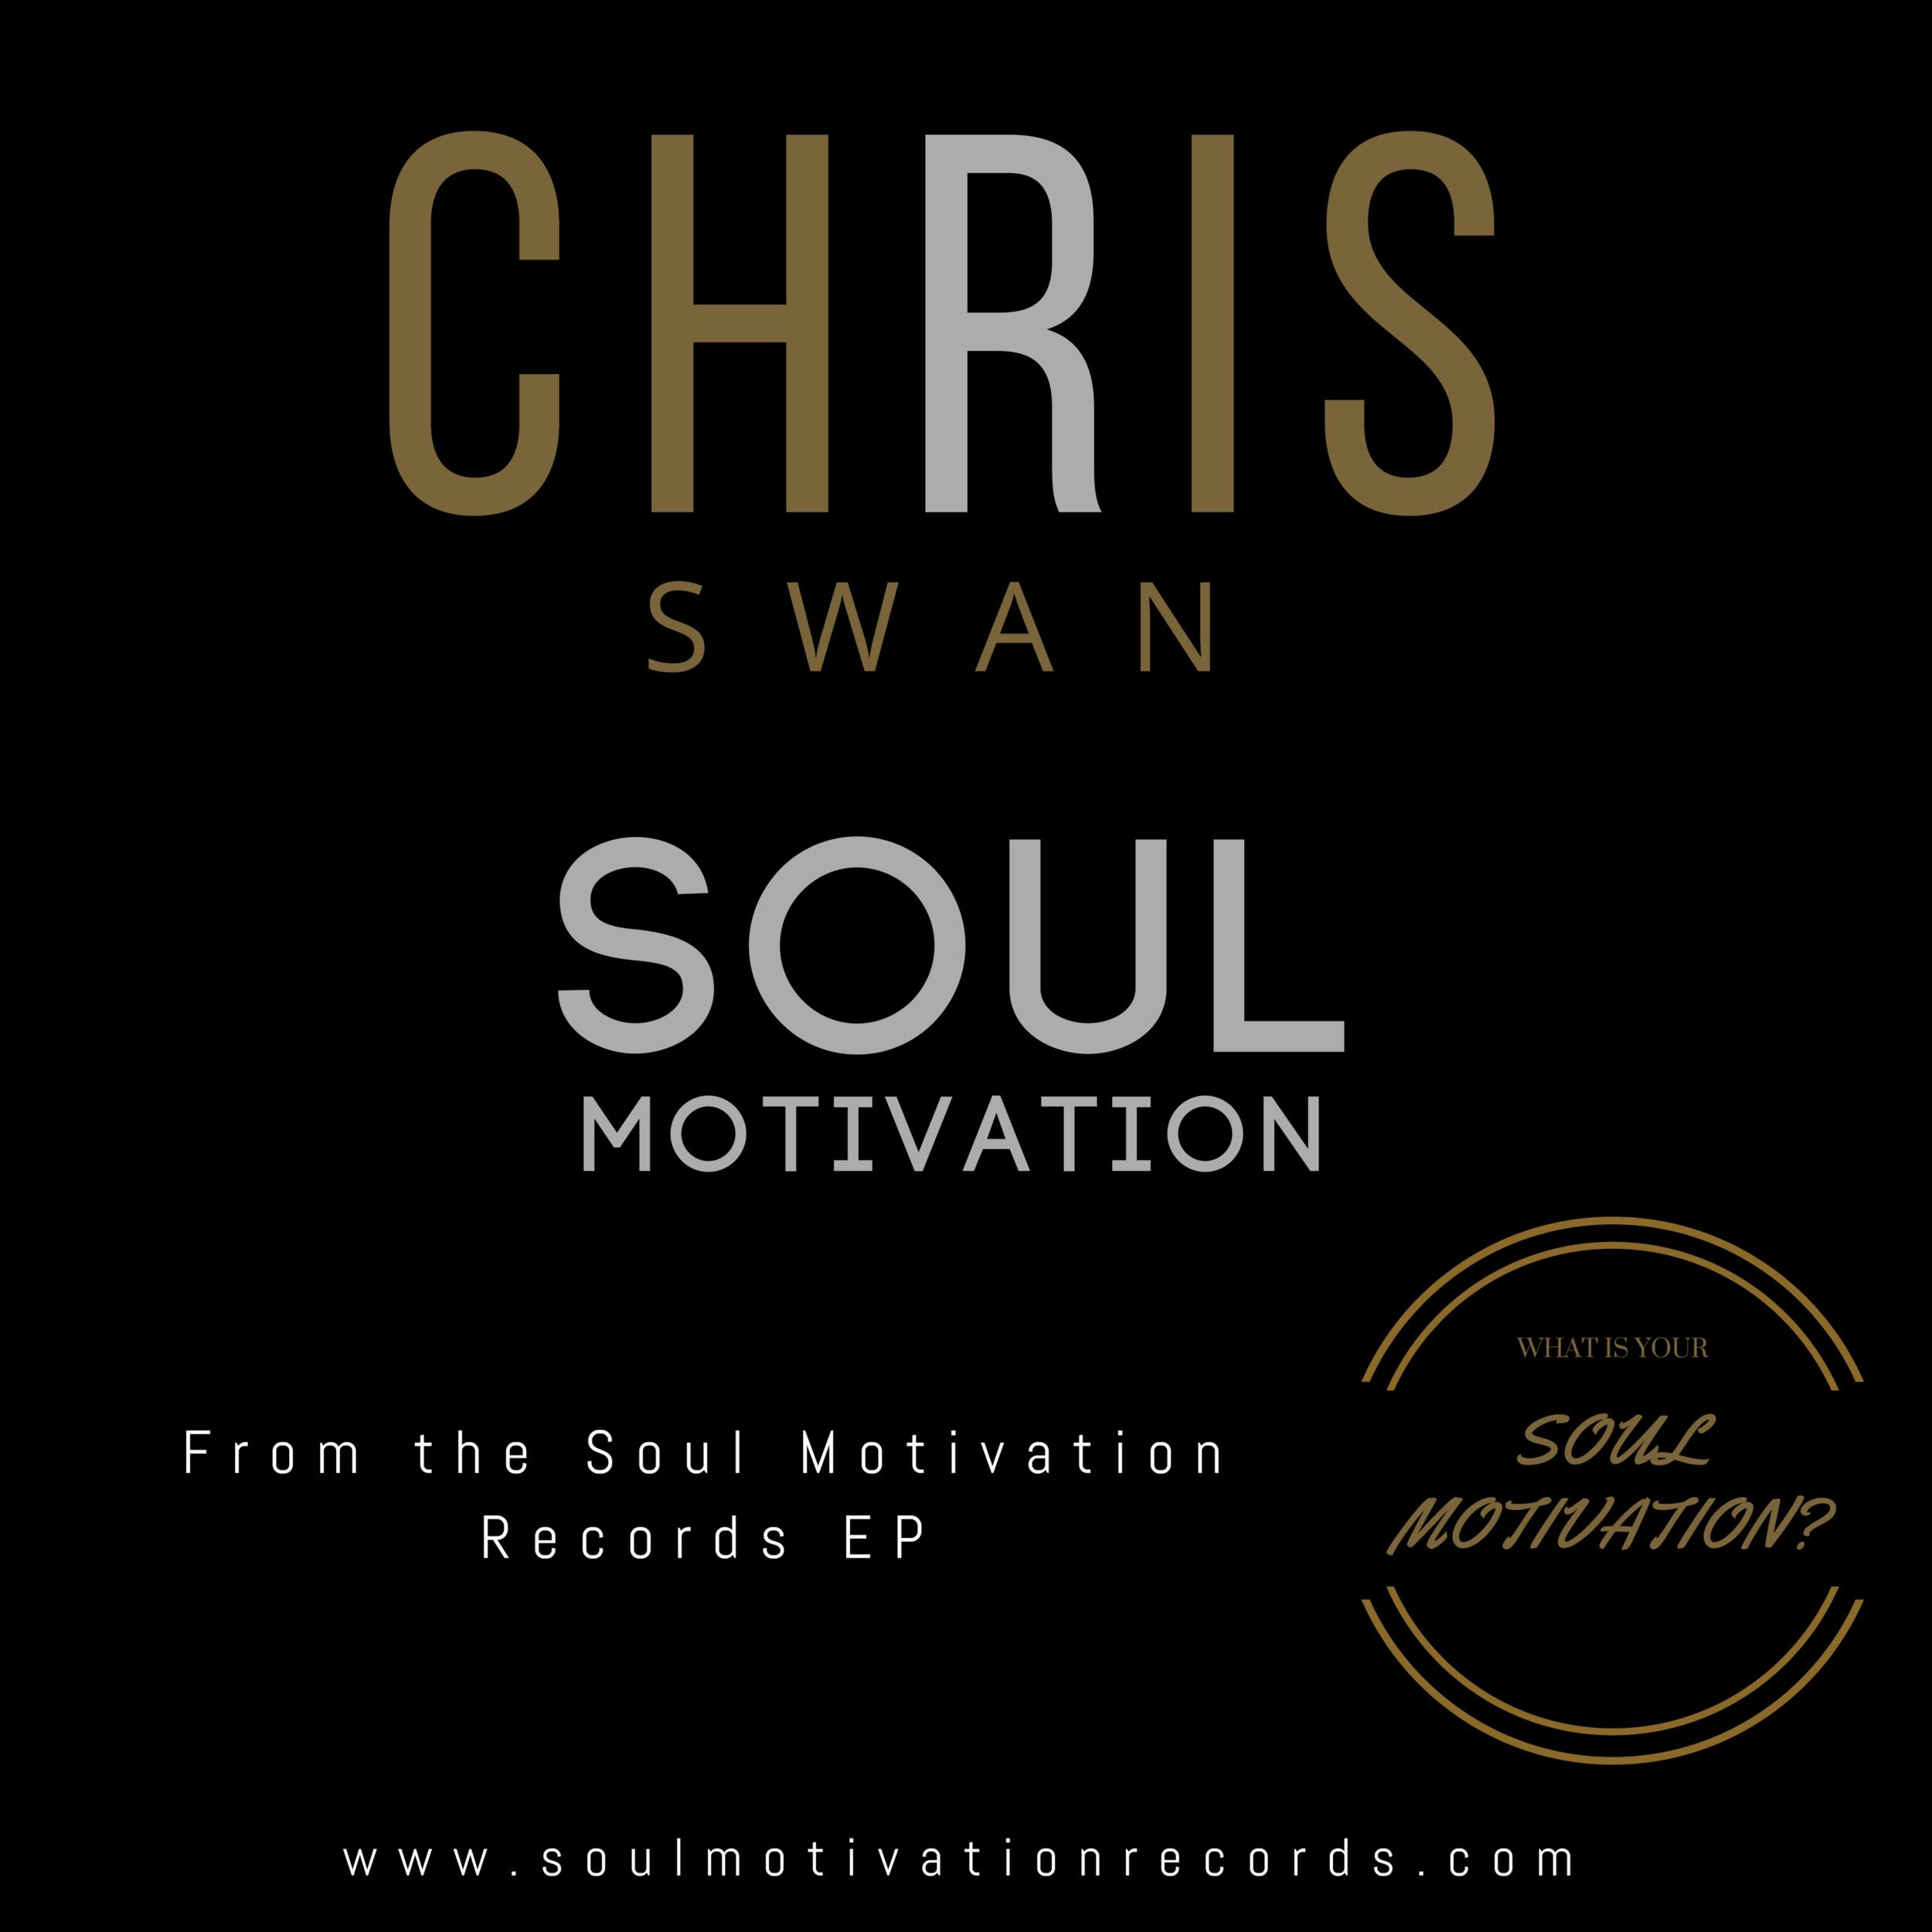 Soul Motivation Single Cover - Chris Swan.png